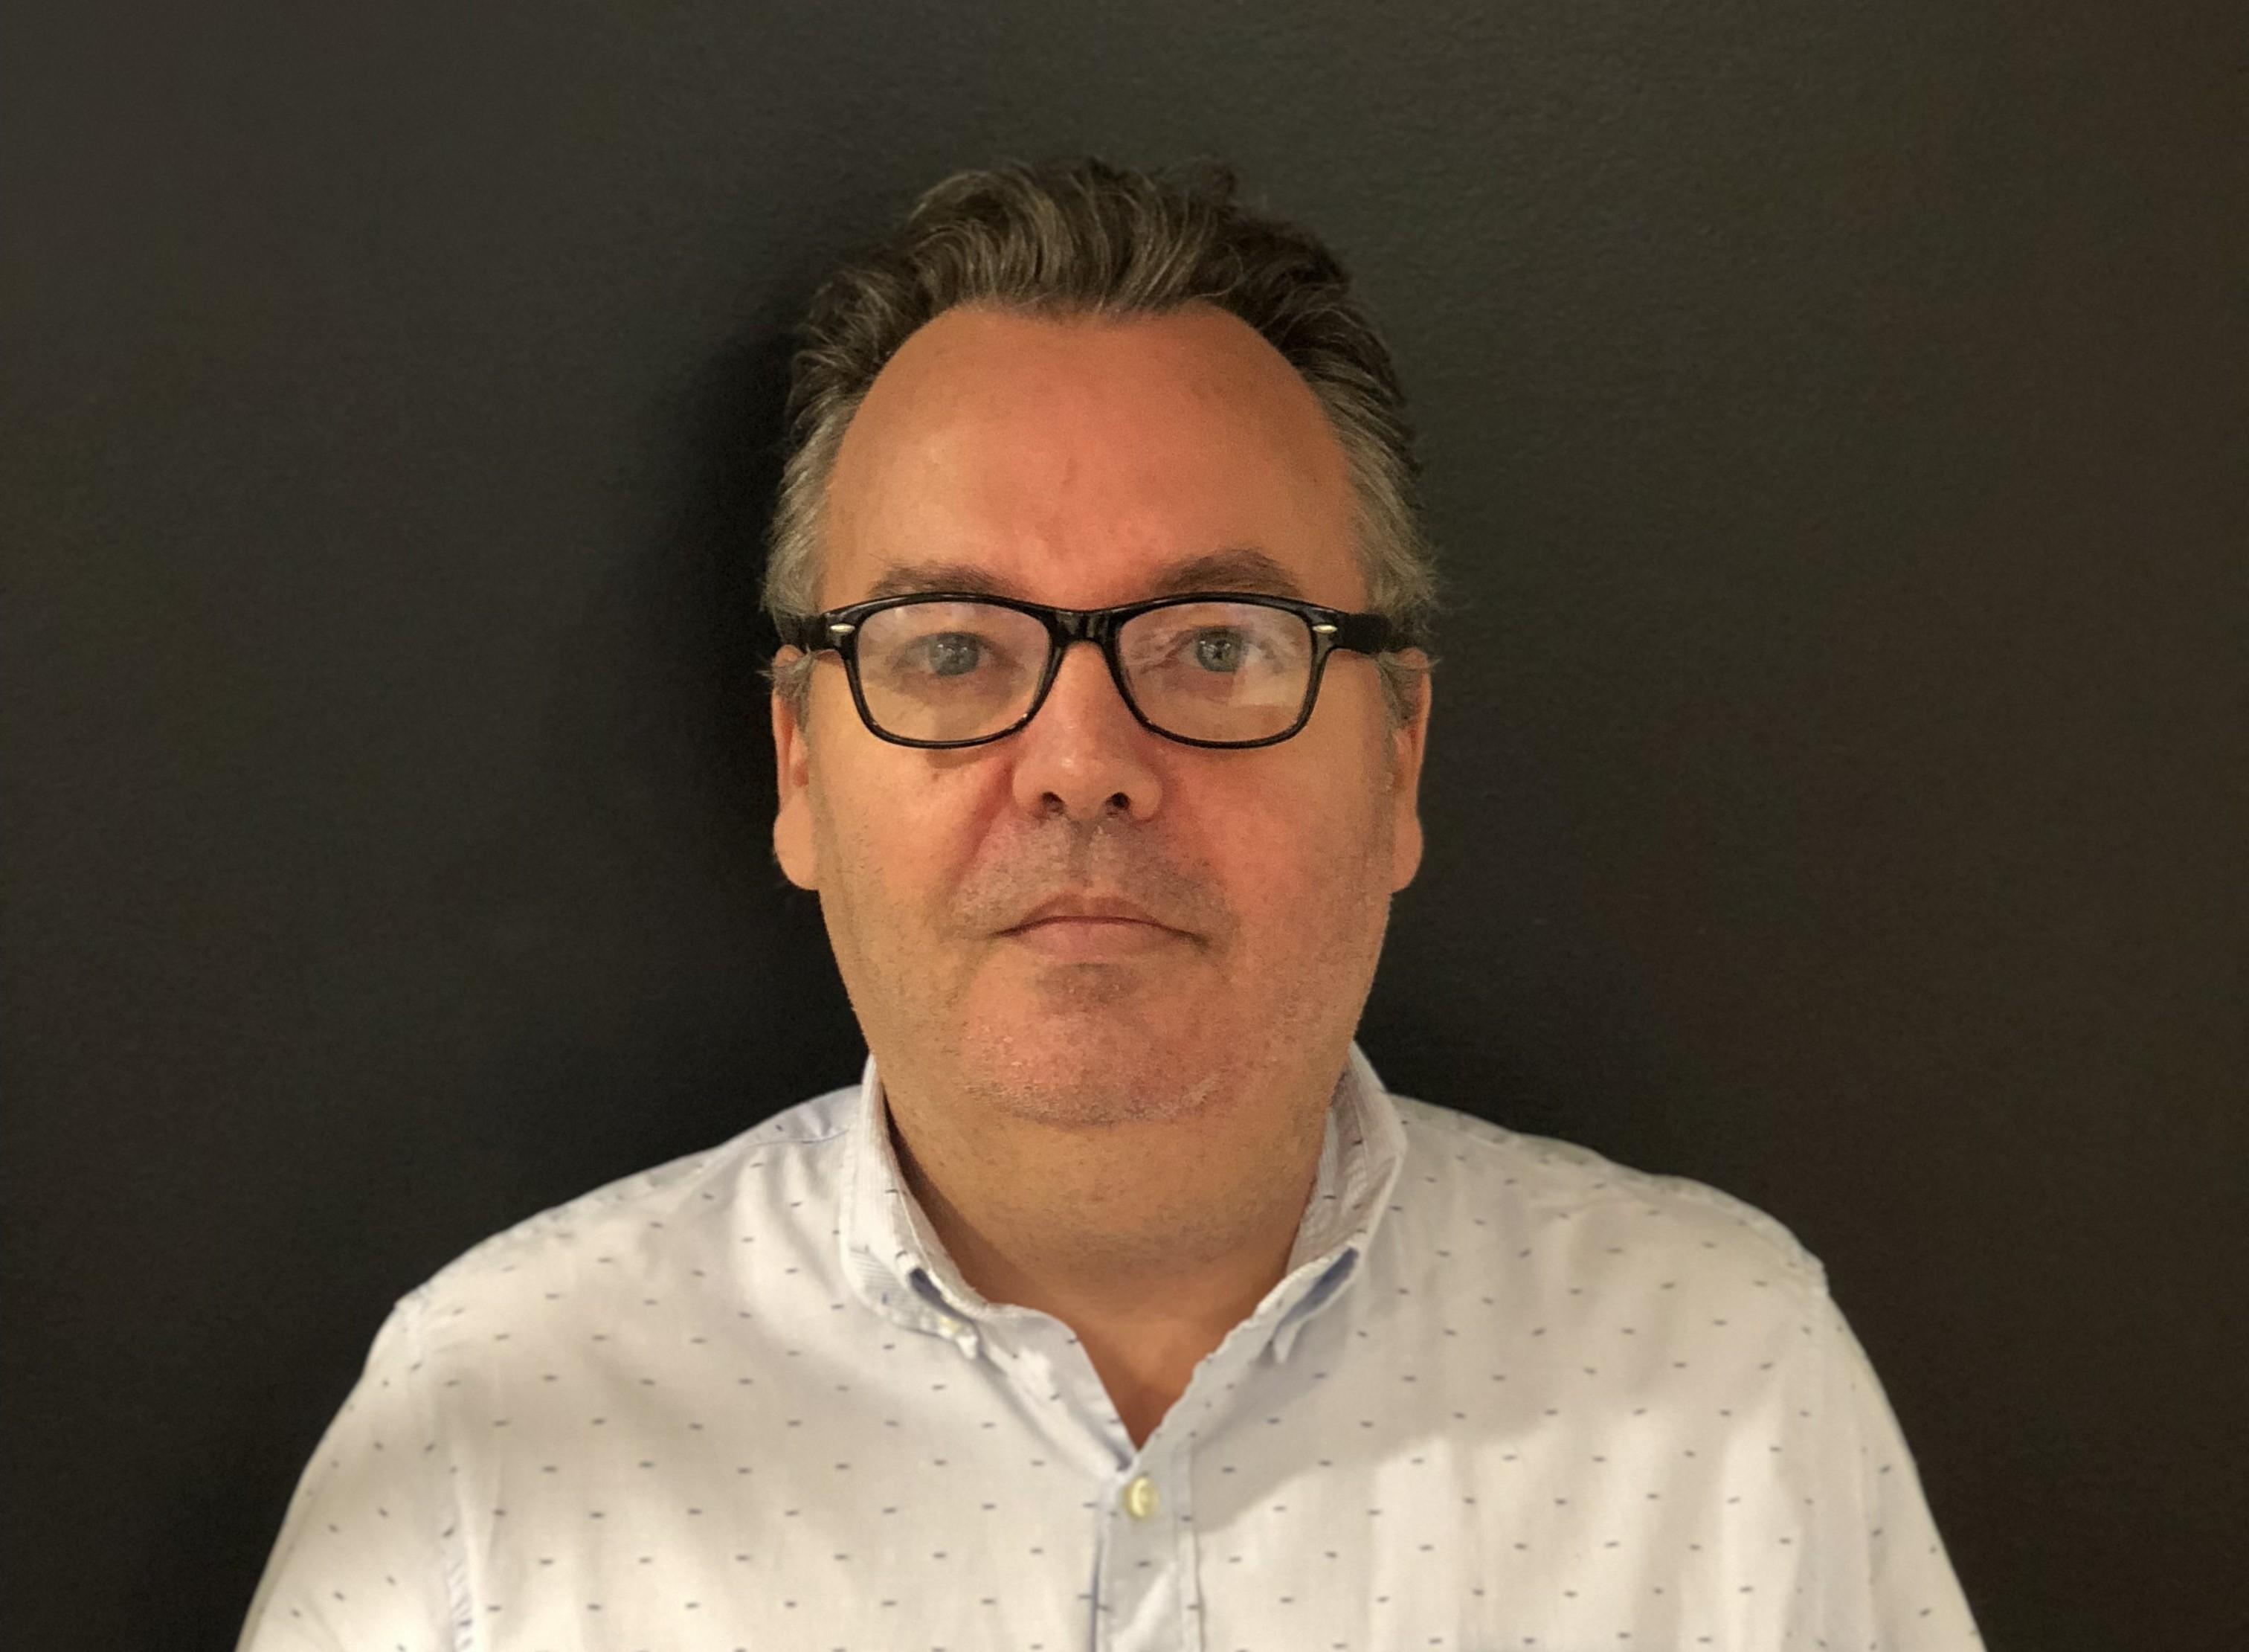 Laurent Lepsch